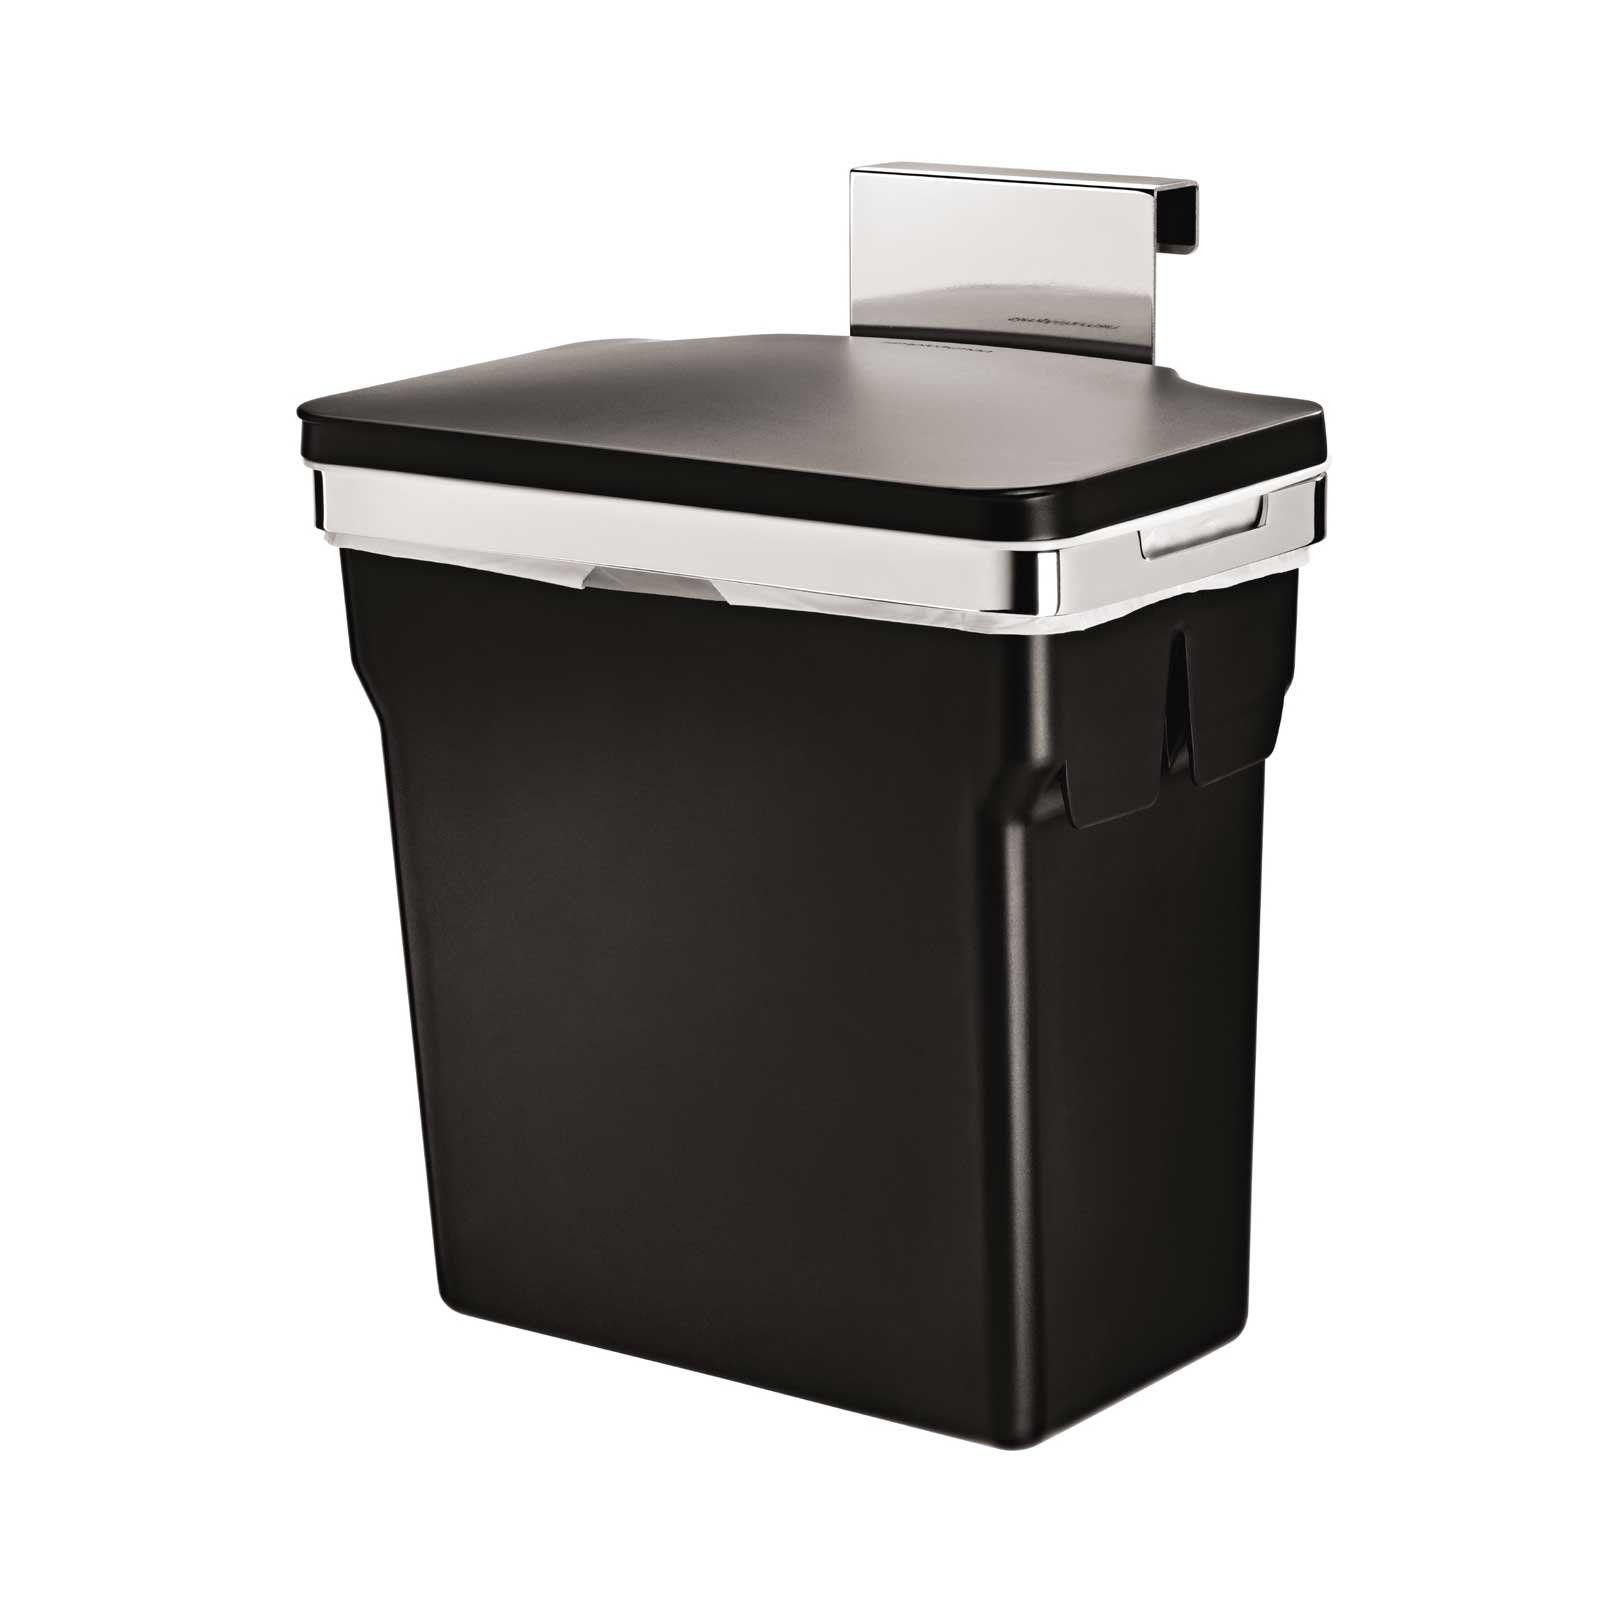 Simplehuman incabinet trash can litergallon just